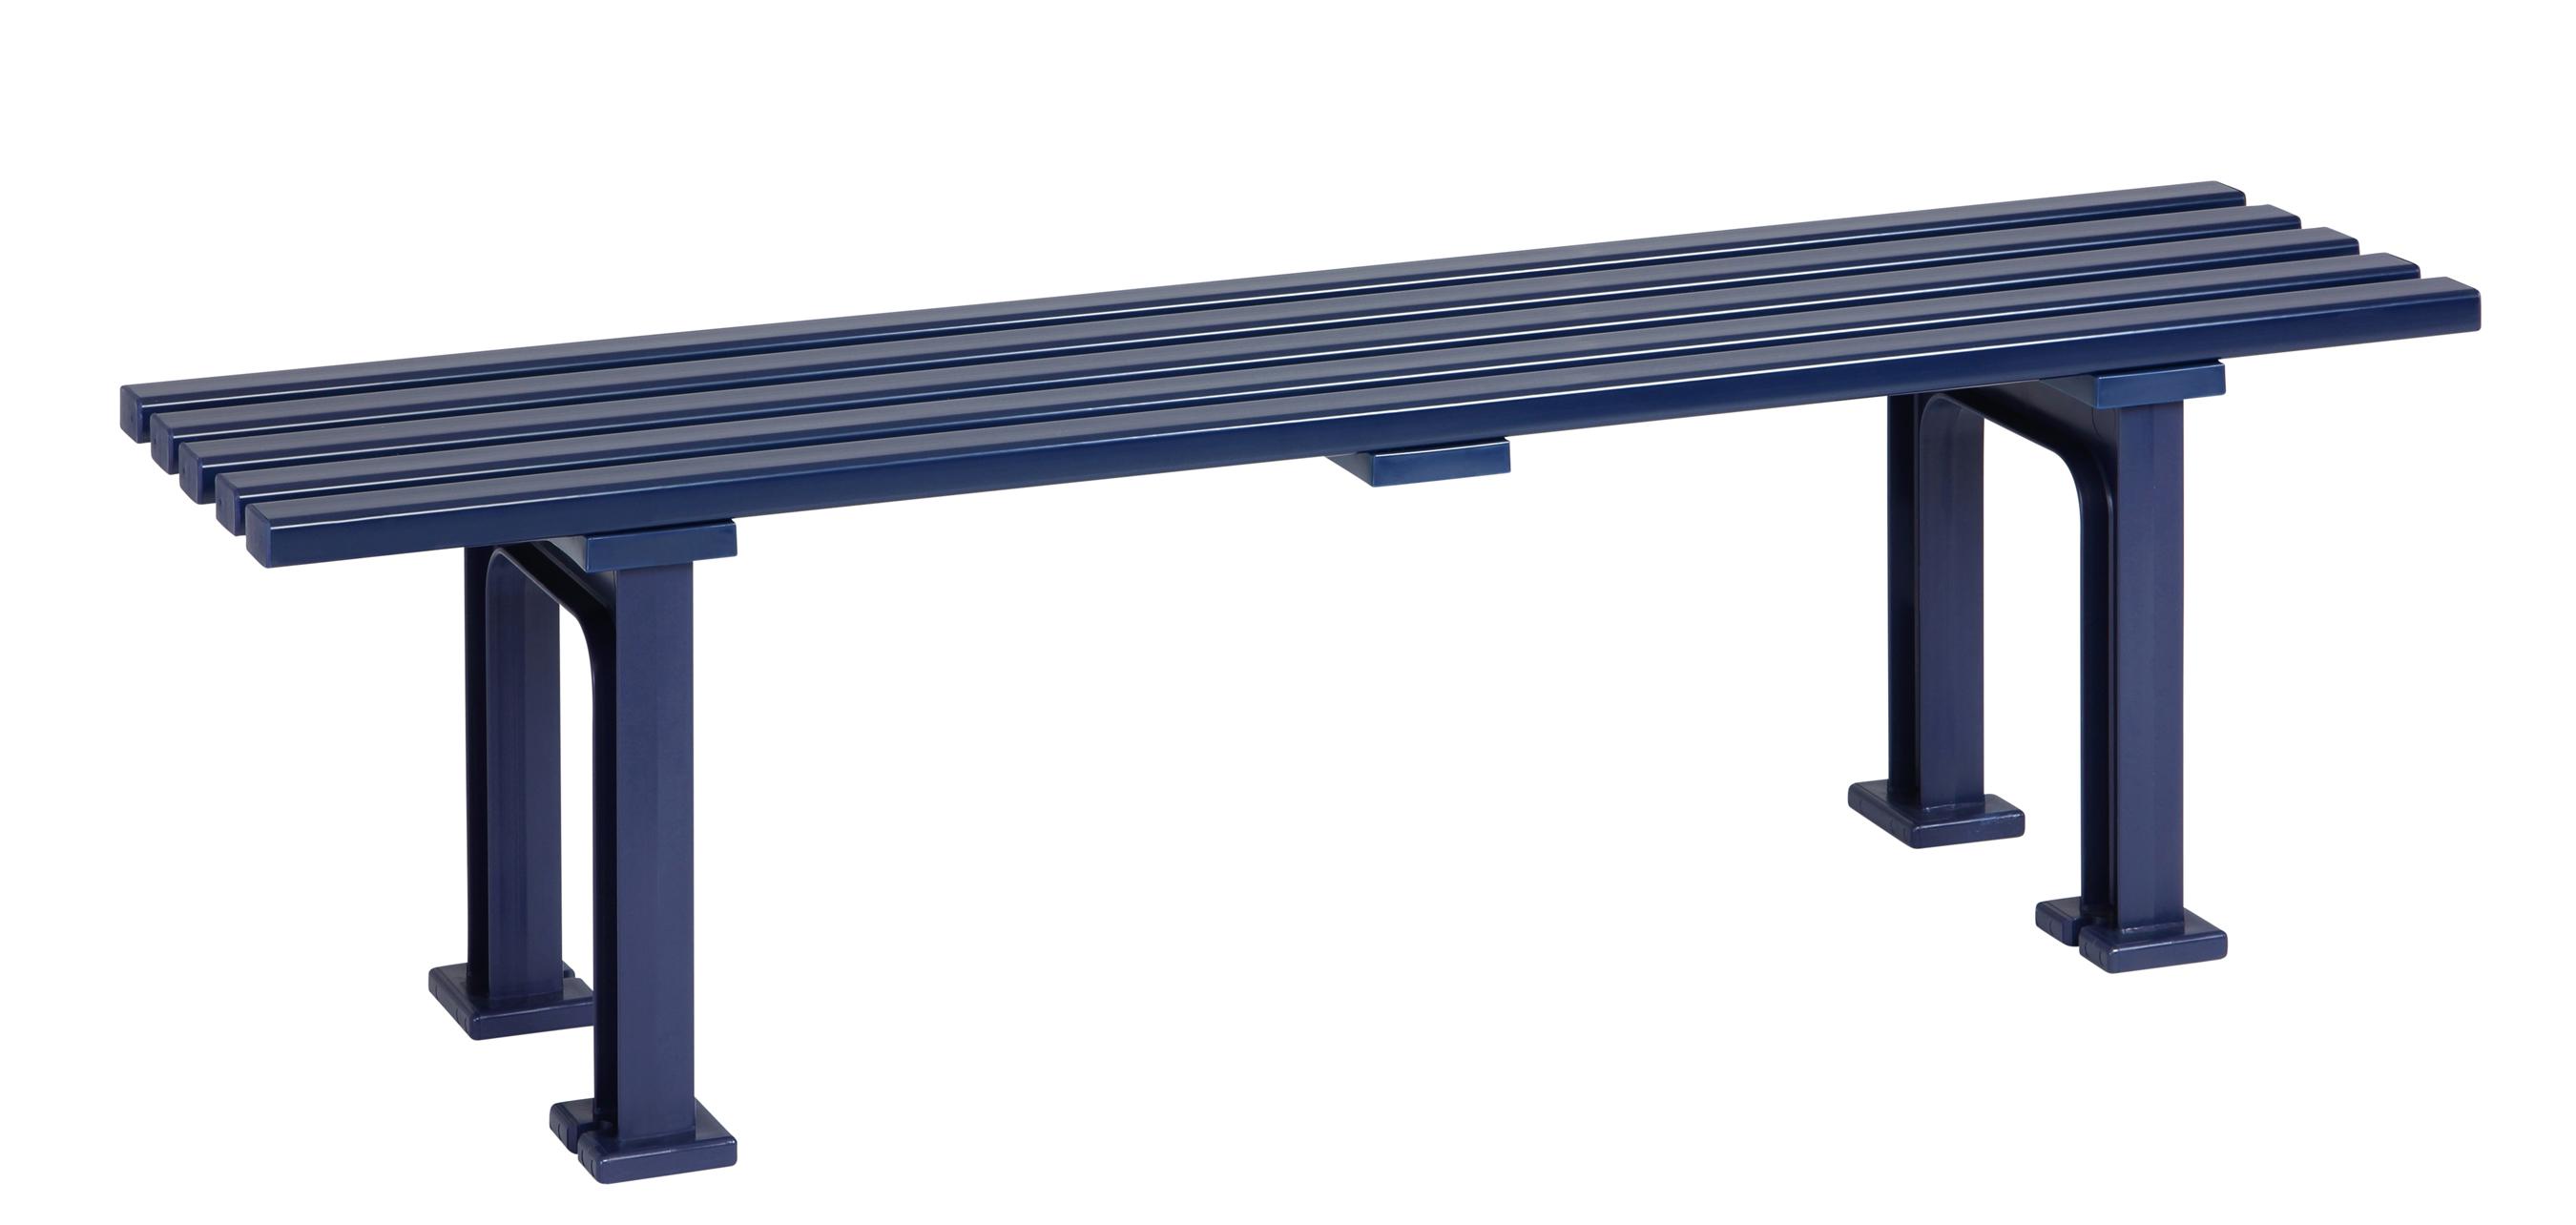 Blome Gartenbank / 3-Sitzer Bank Mono I Kunststoff blau 150cm Bild 1